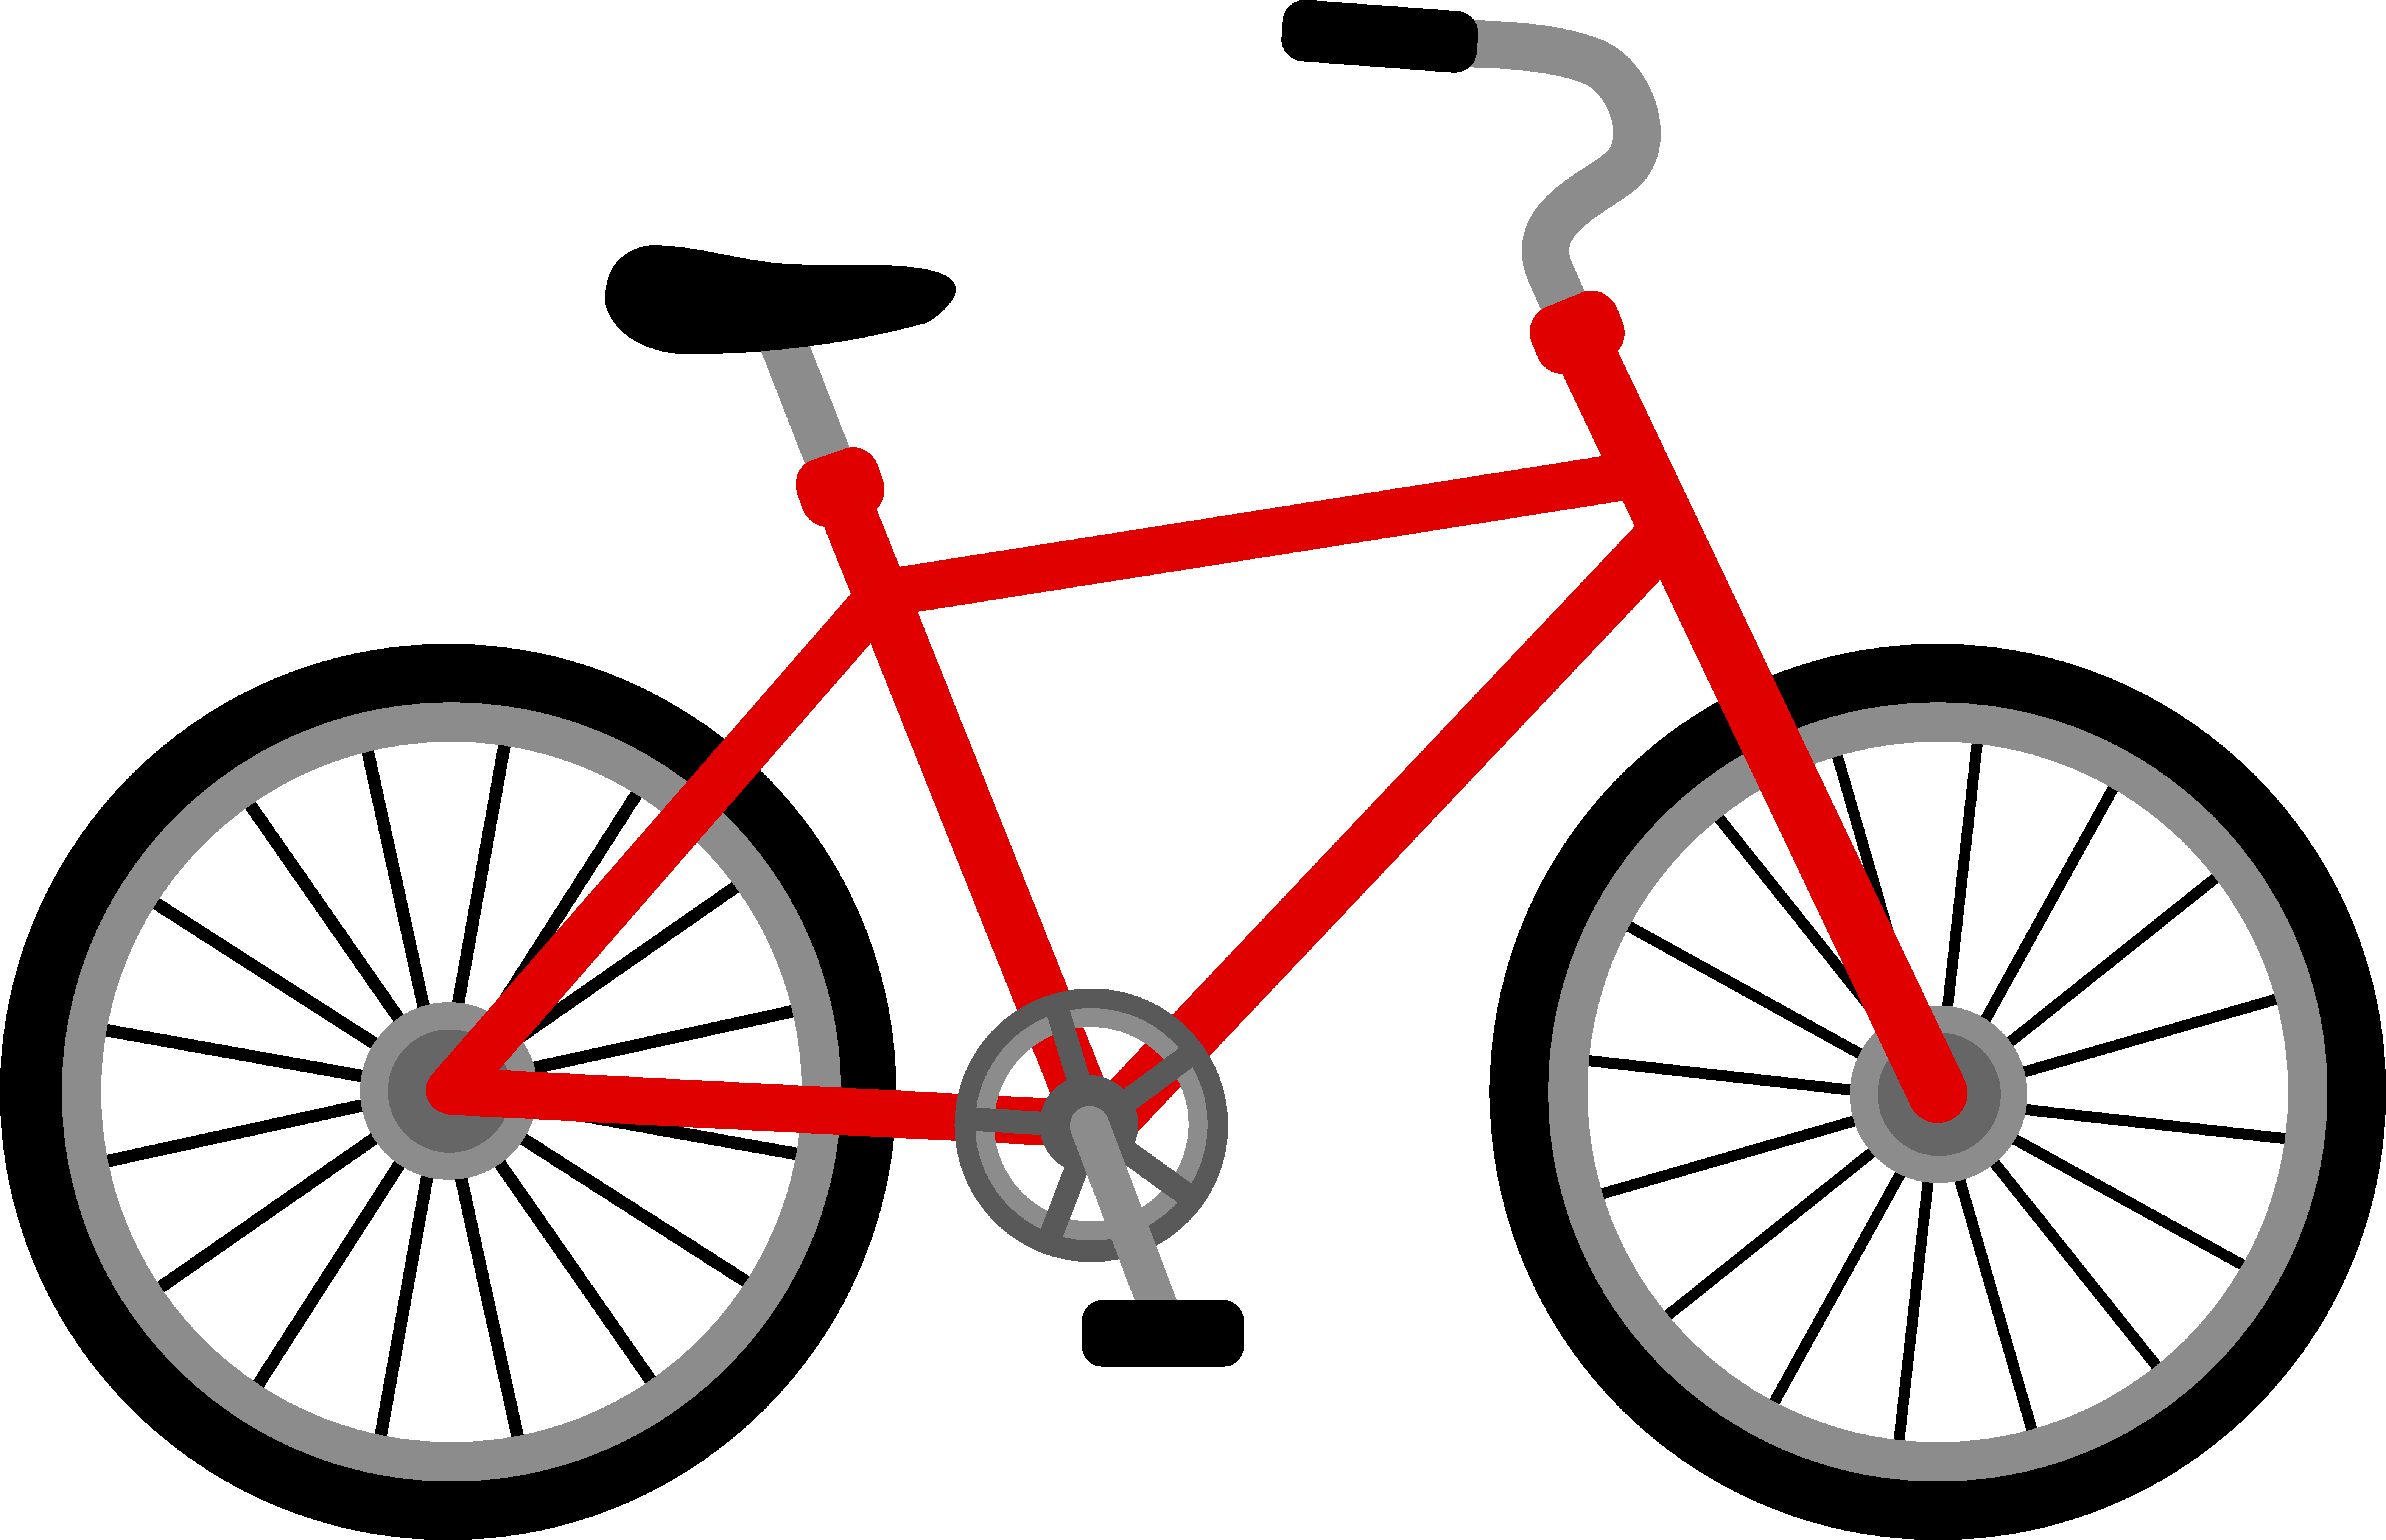 Cycle Clipart U0026middot; Bike Clipart-cycle clipart u0026middot; bike clipart-14